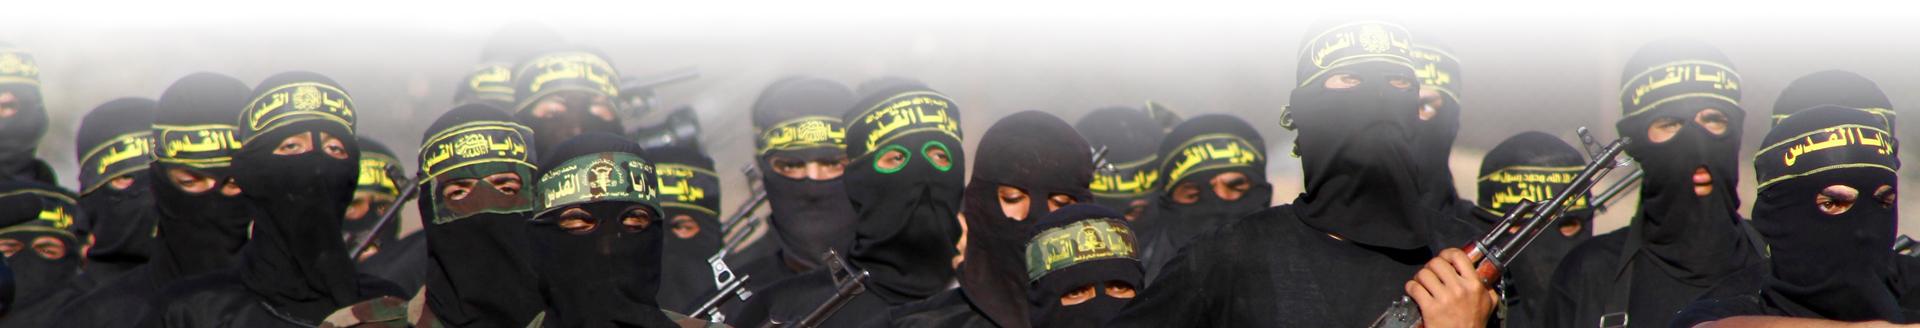 Schertzman v. Iran and IRGC Case - Osen LLC